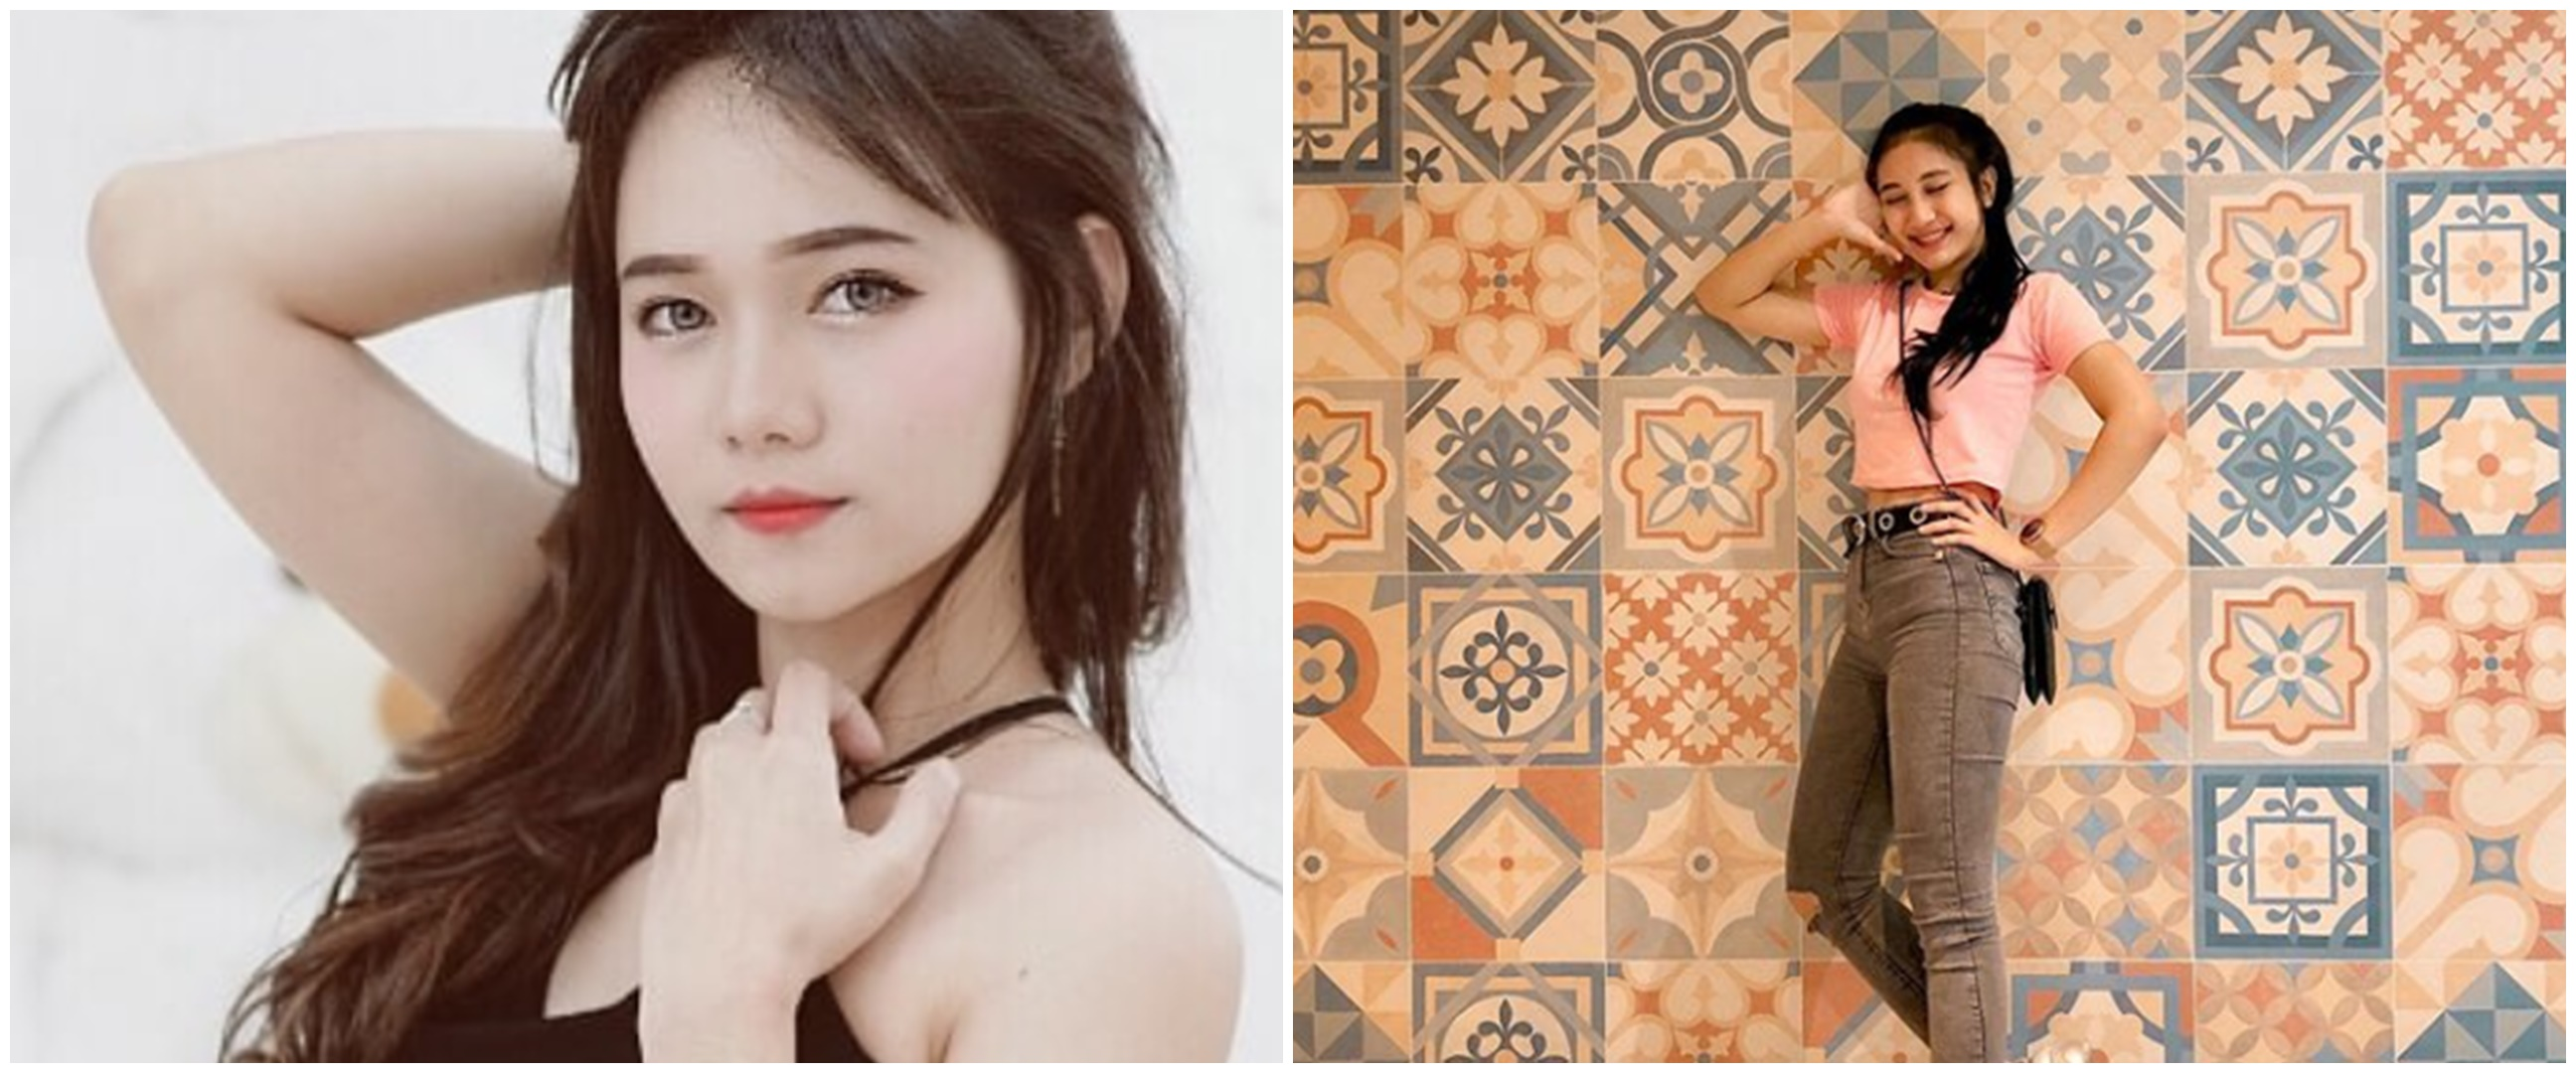 Pesona 15 artis cantik TikTok yang jadi idola warganet